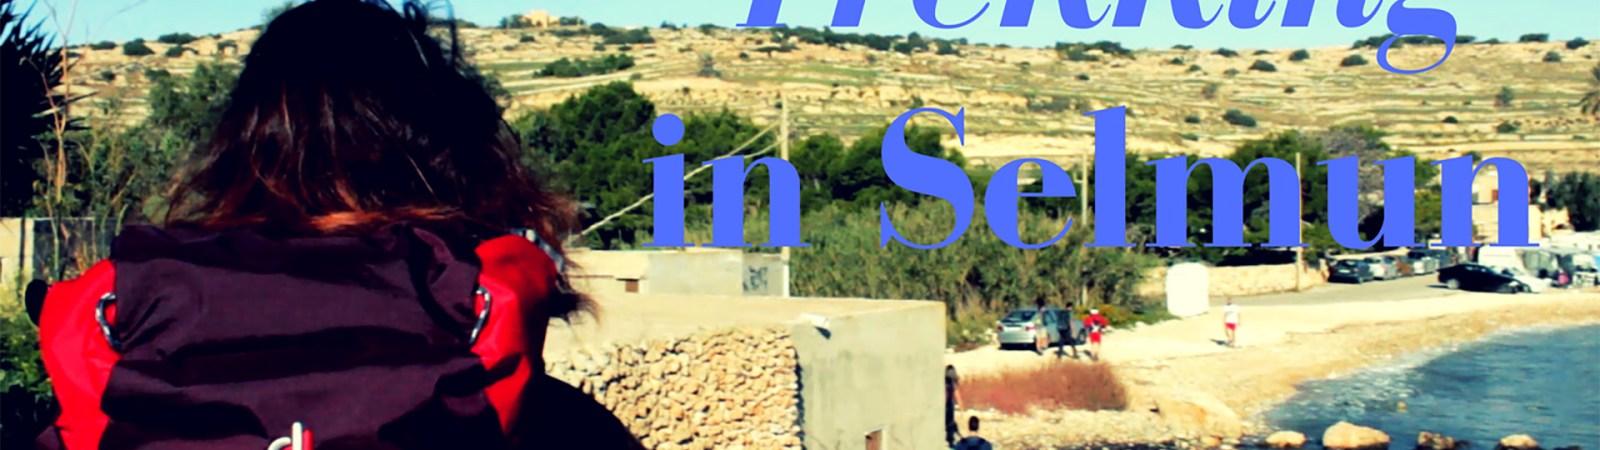 Trekking in Selmun – Malta